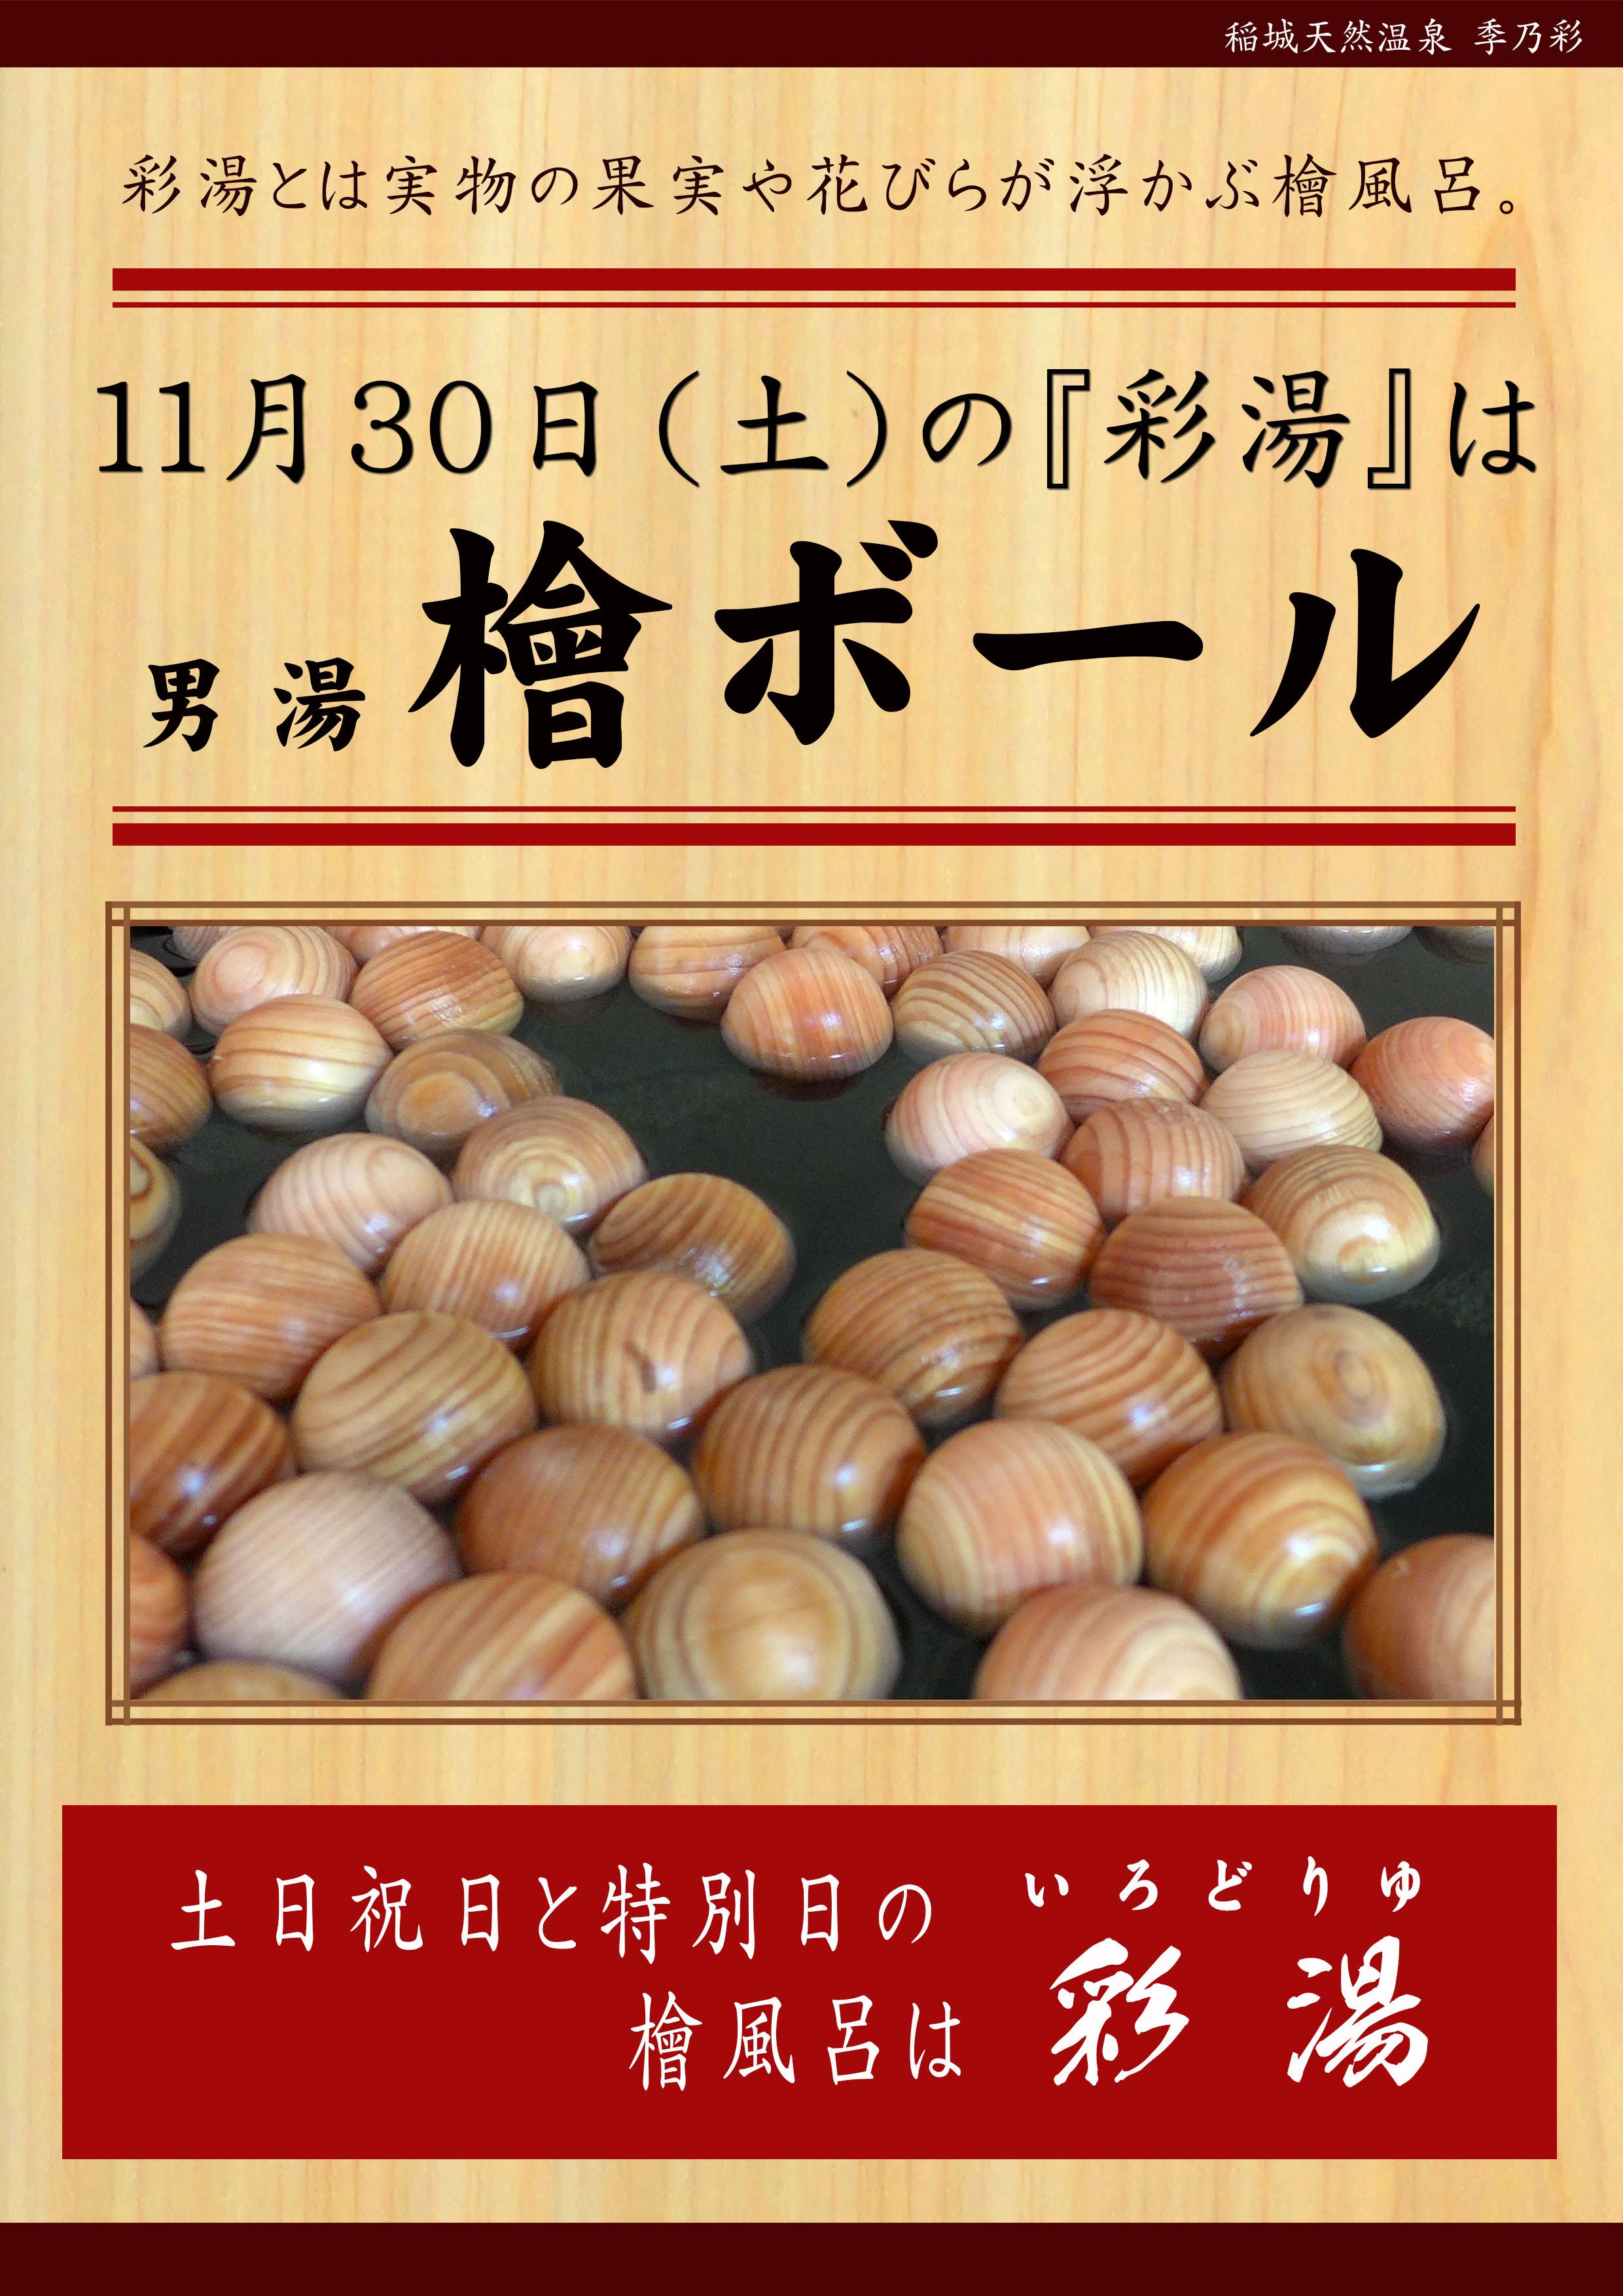 20191130 POP イベント 彩湯 男湯 檜ボール